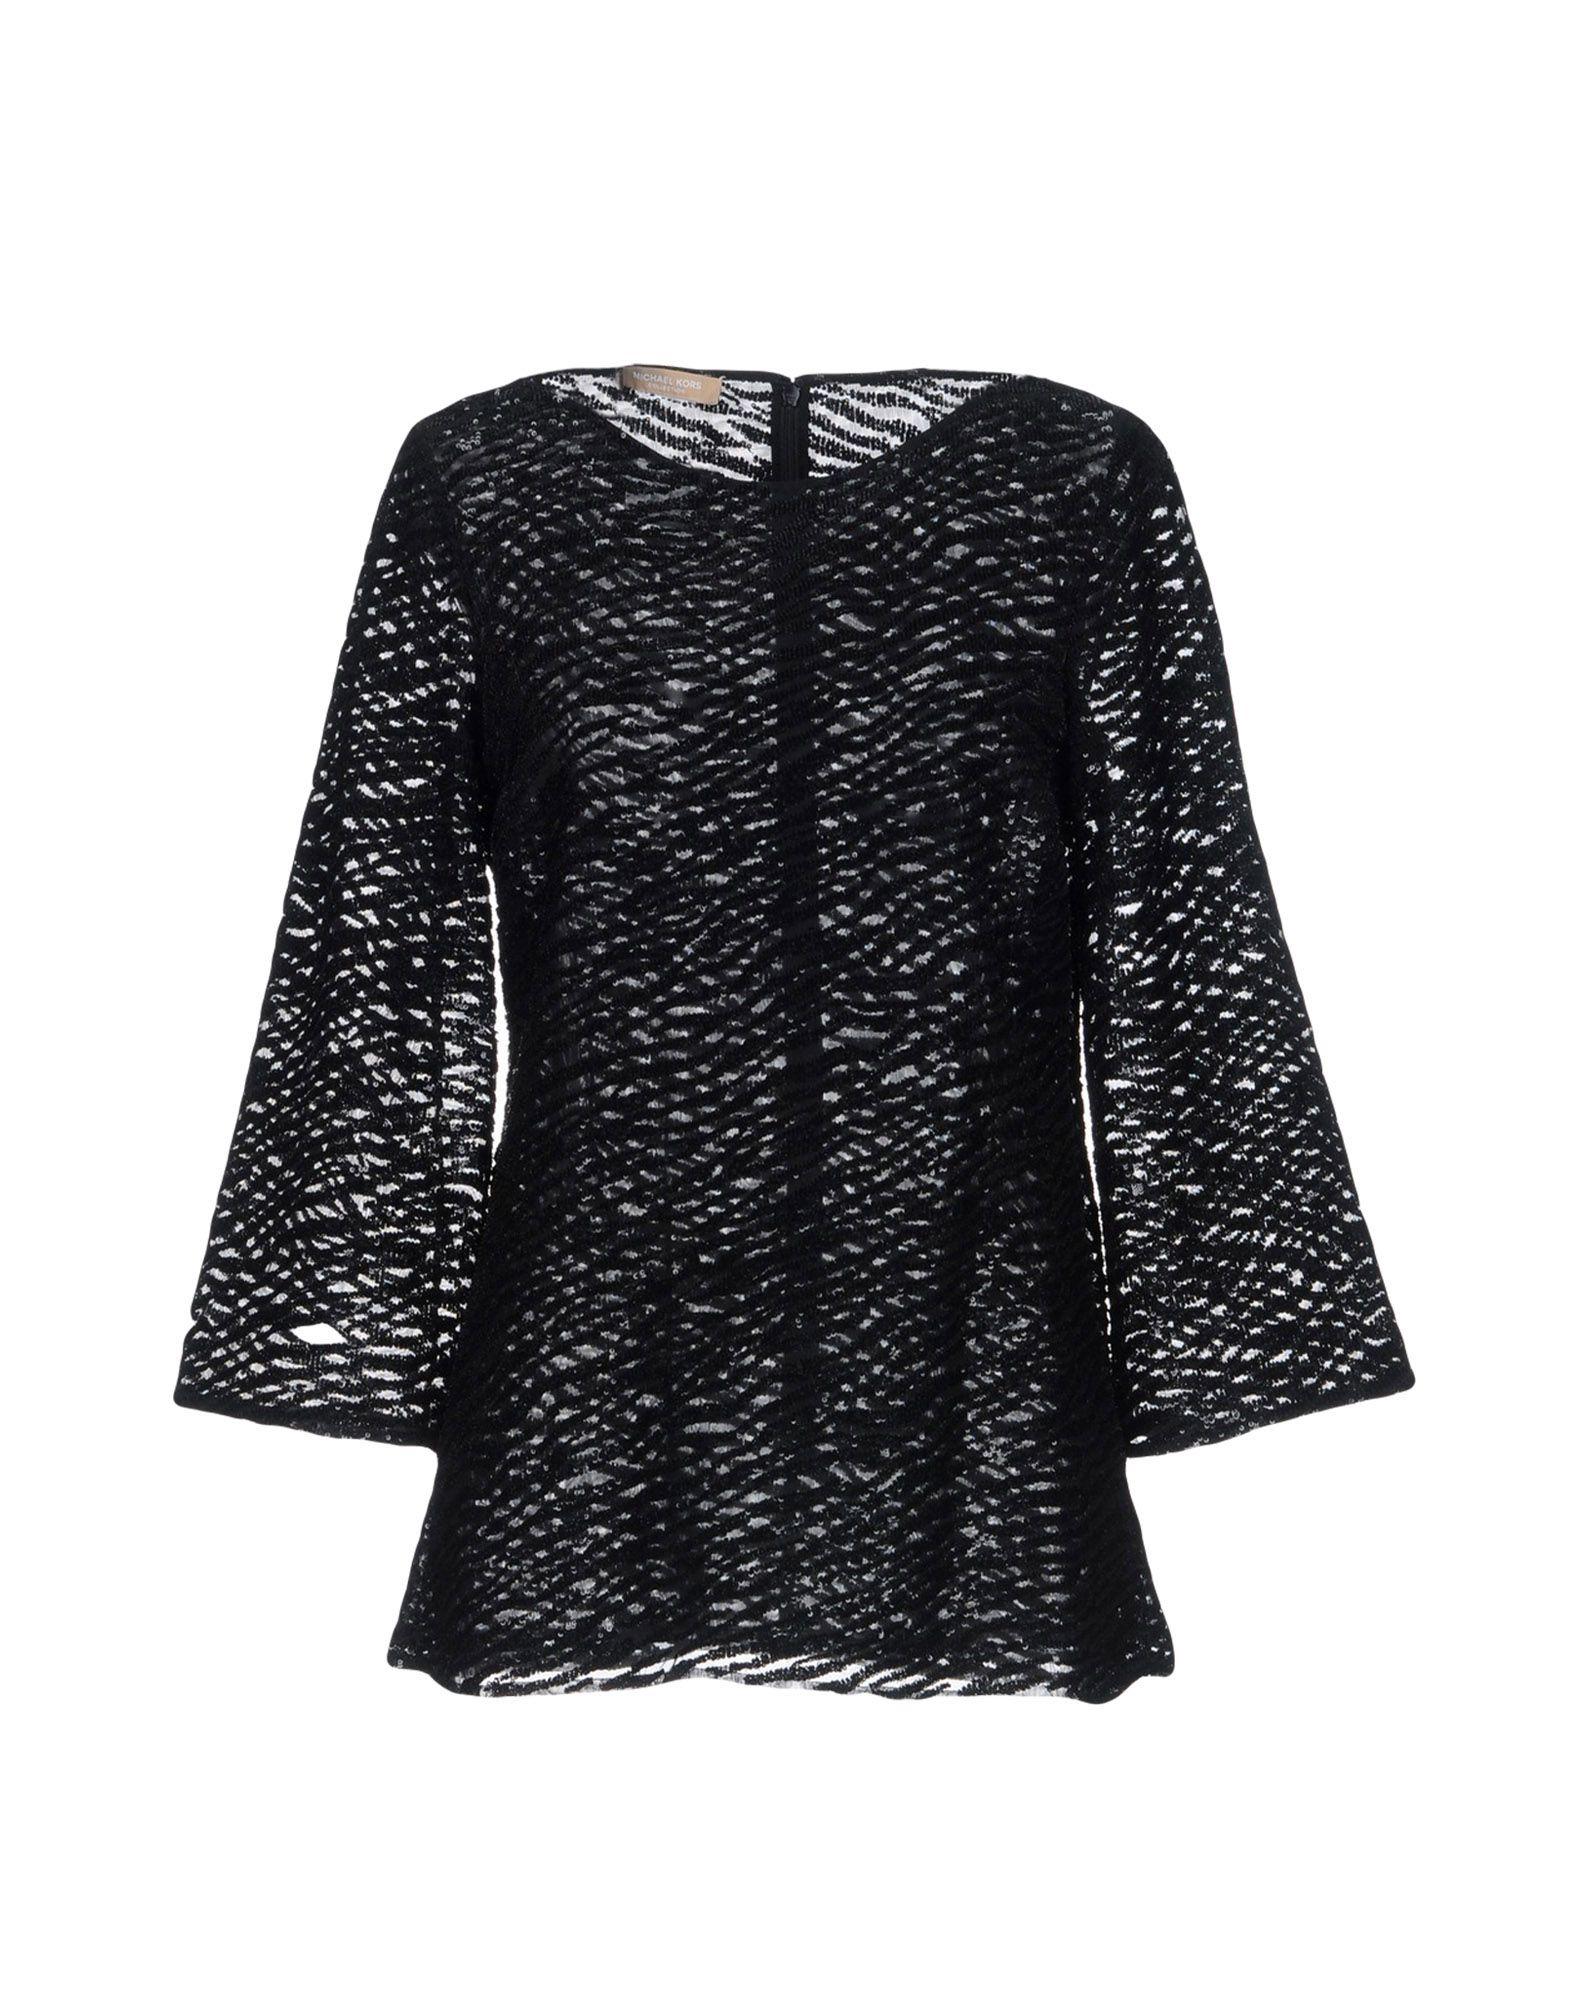 Фото - MICHAEL KORS COLLECTION Блузка michael kors collection юбка длиной 3 4